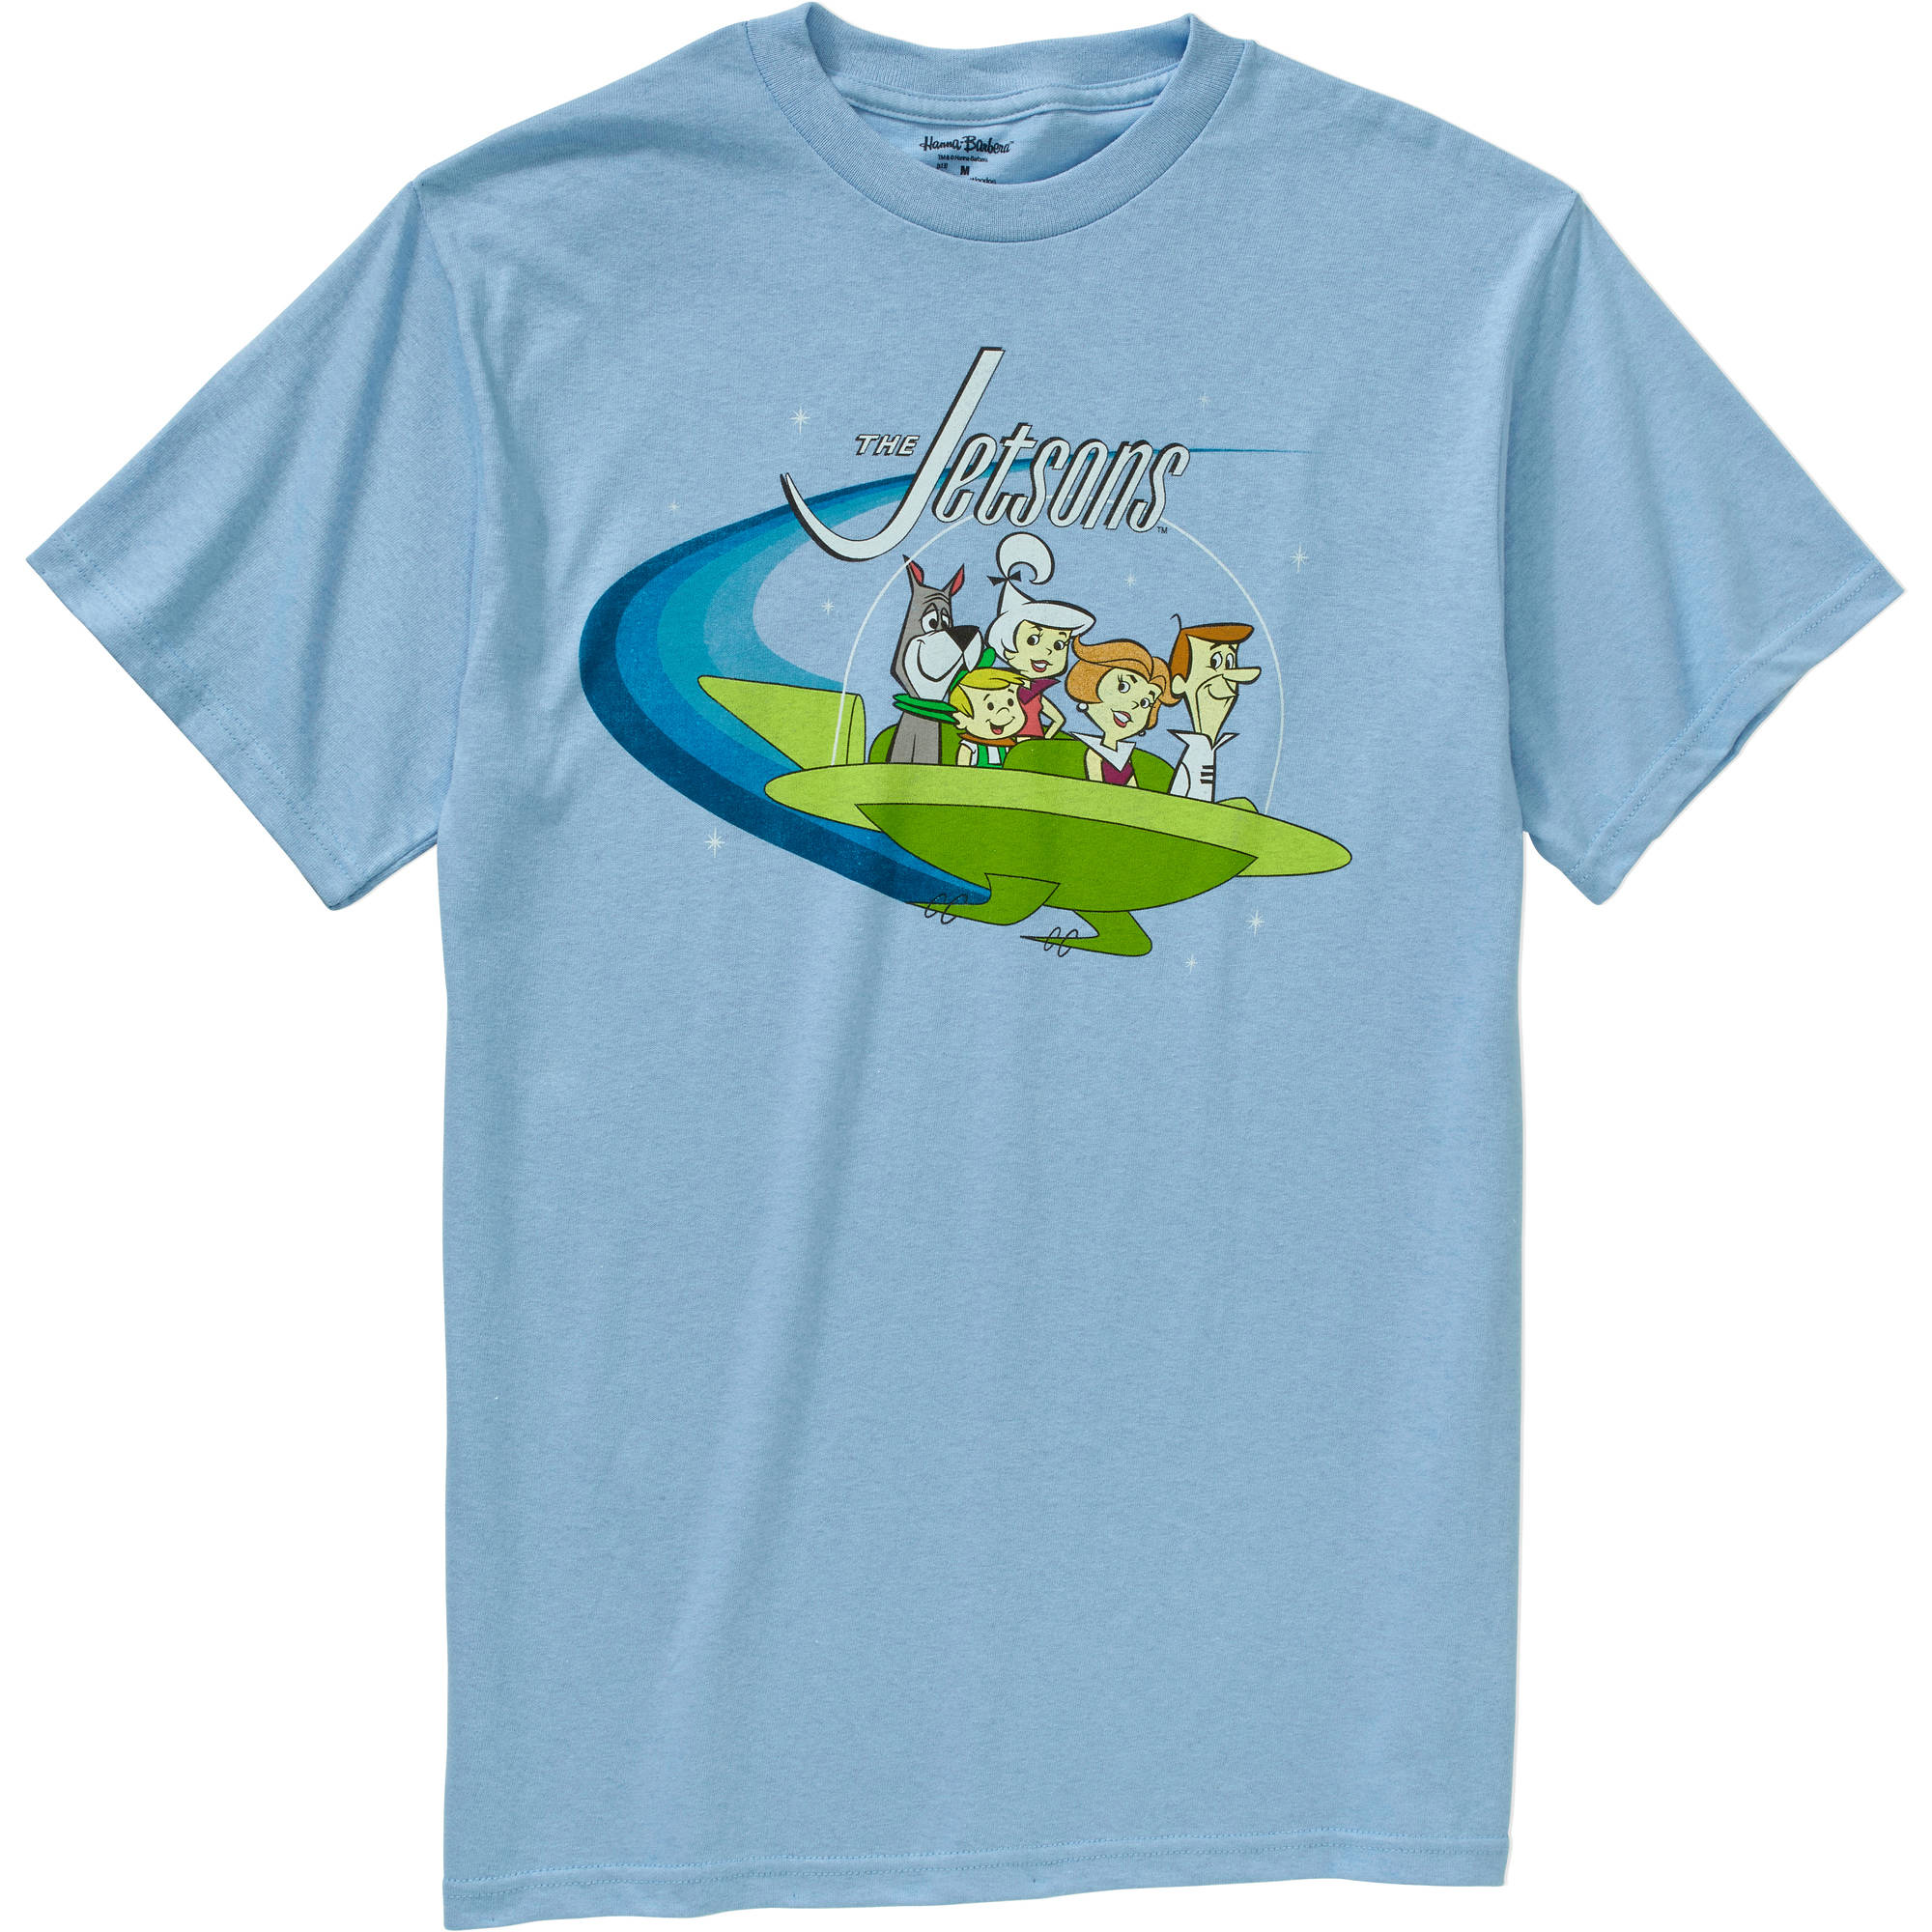 Jetsons Men's Vintage Short Sleeve T-Shirt